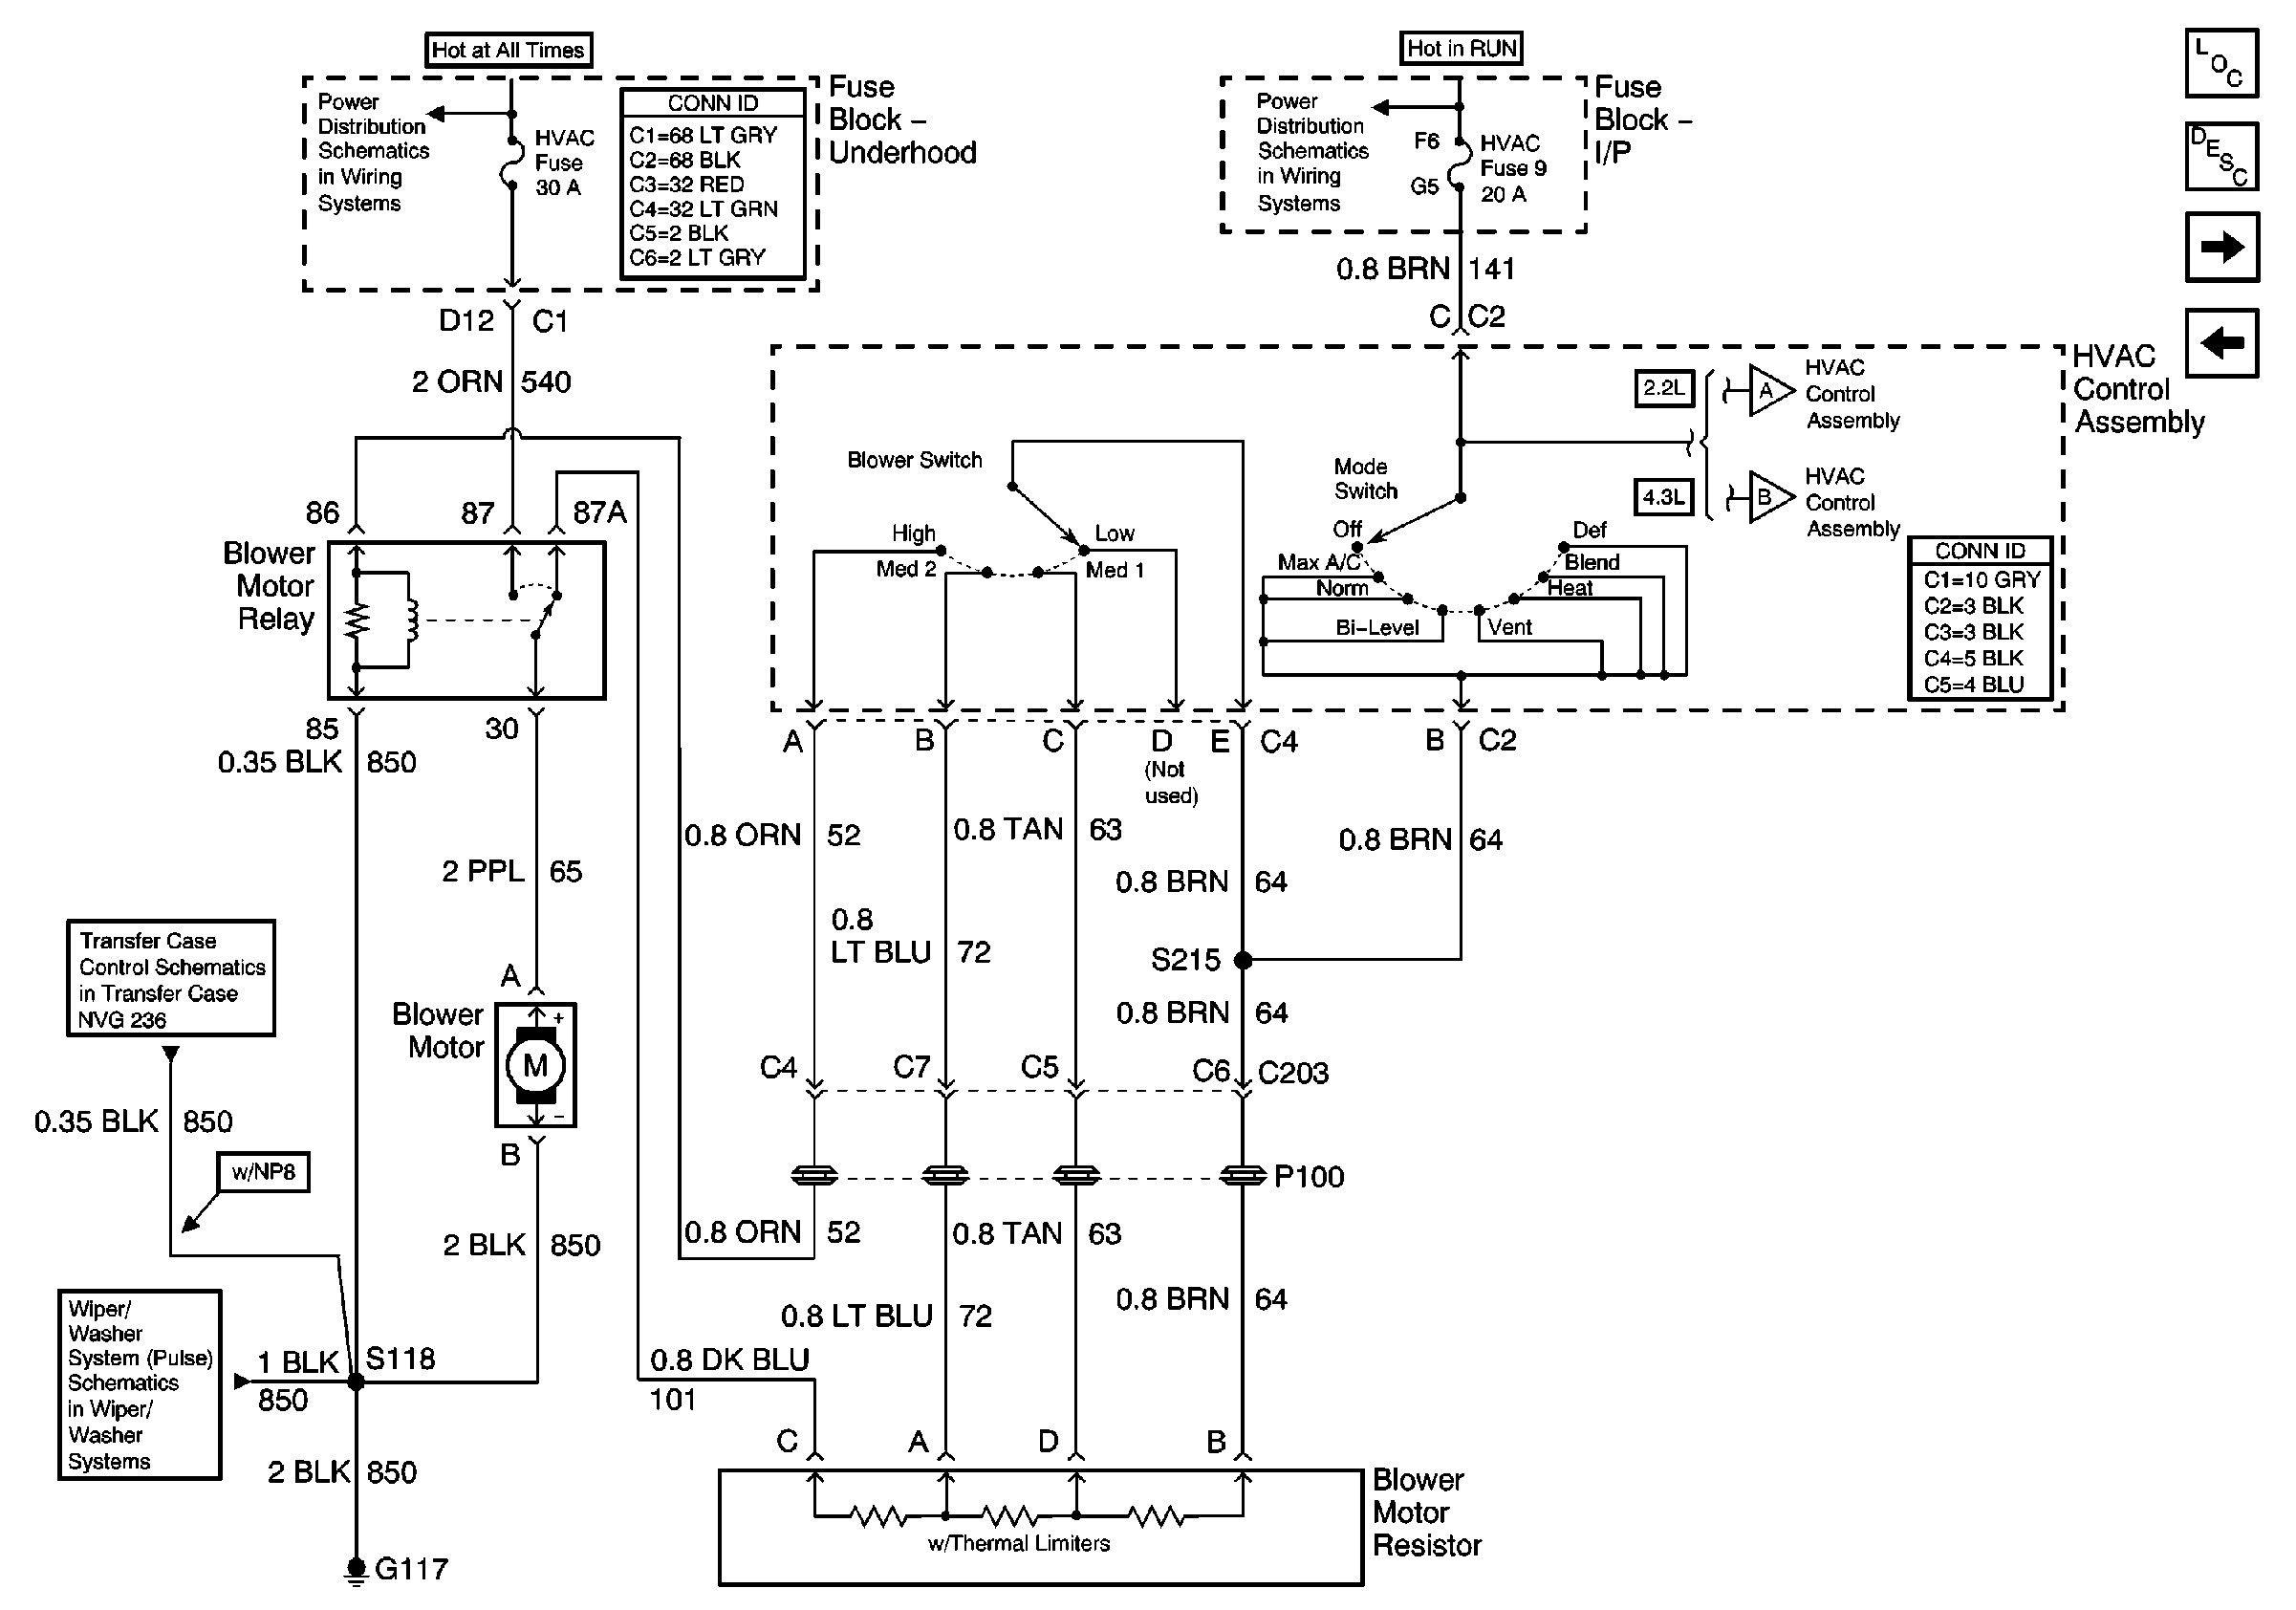 94 S10 Blower Motor Wiring Diagram Residential Electrical Symbols Diagram Electrical Diagram Electrical Symbols